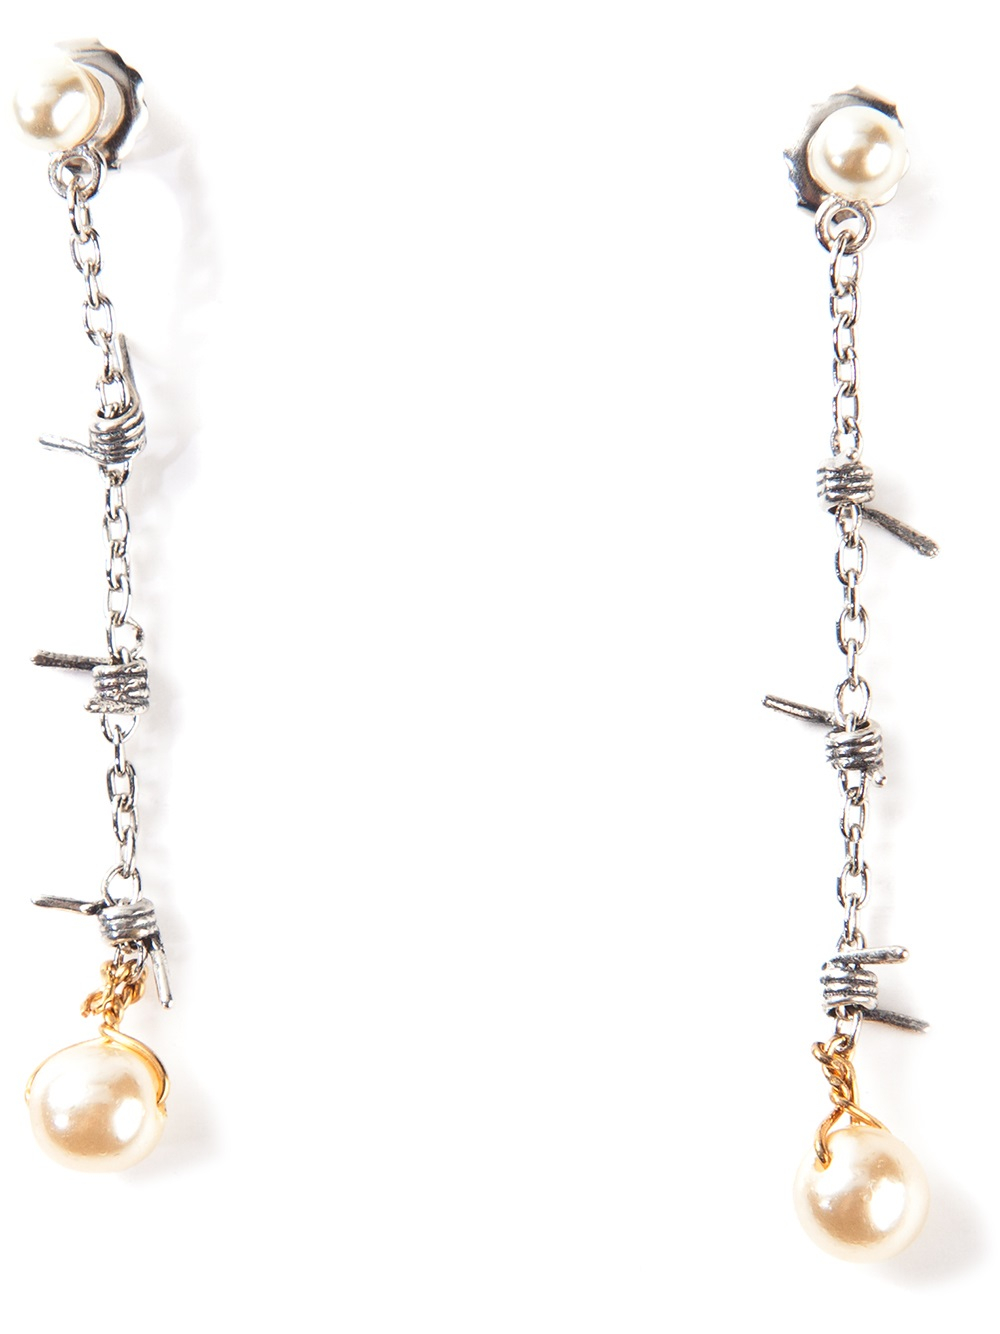 Lyst Tom Binns Pearl And Barb Wire Drop Earrings In Metallic